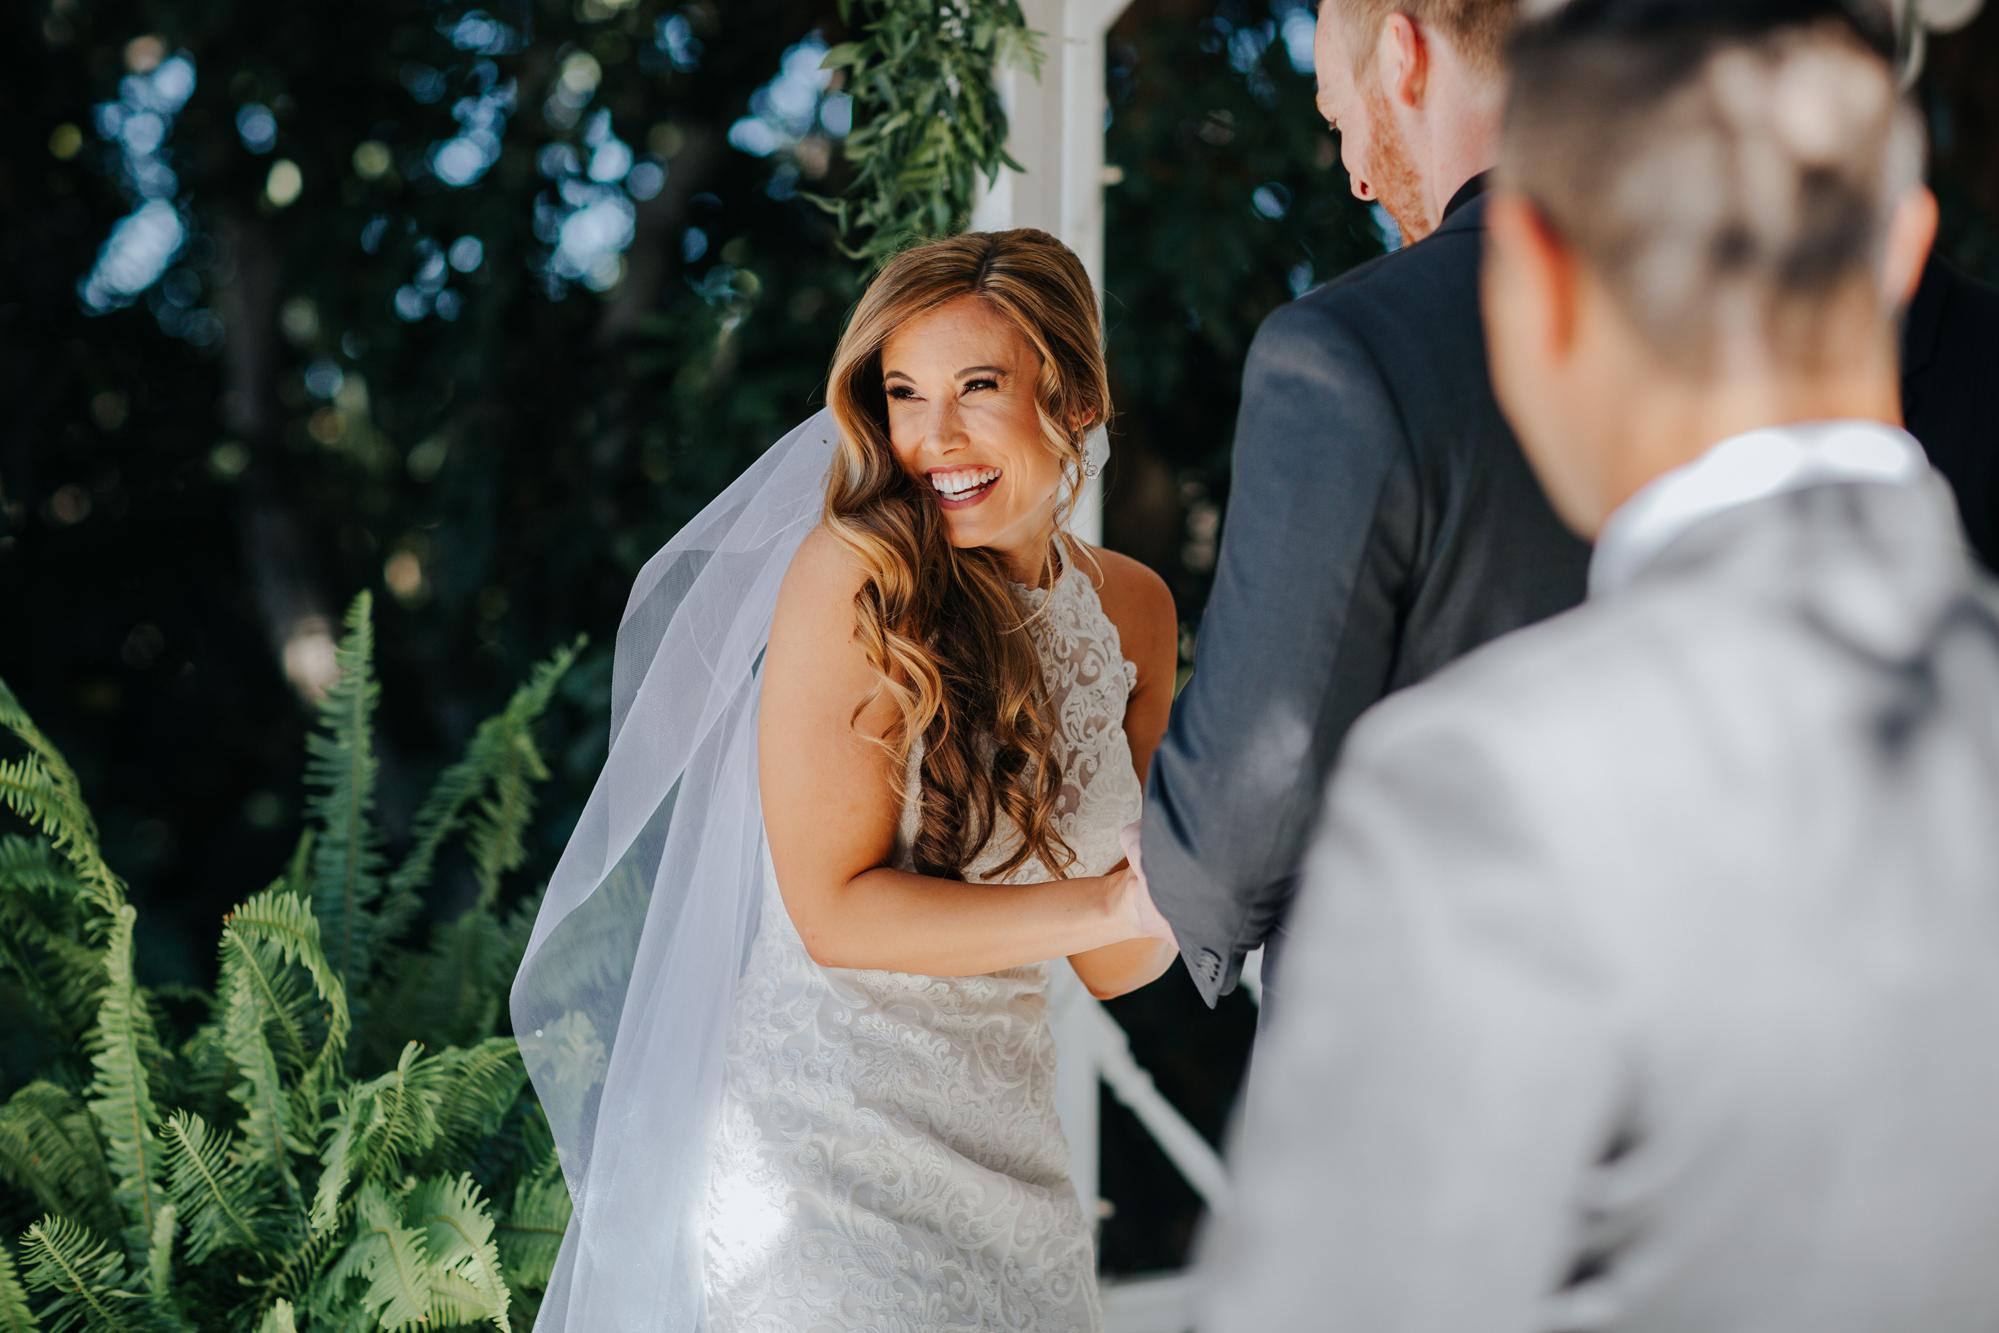 Michelle  Chris Wedding Ceremony by San Diego Wedding Photographer Blessed Wedding (53 of 73).jpg